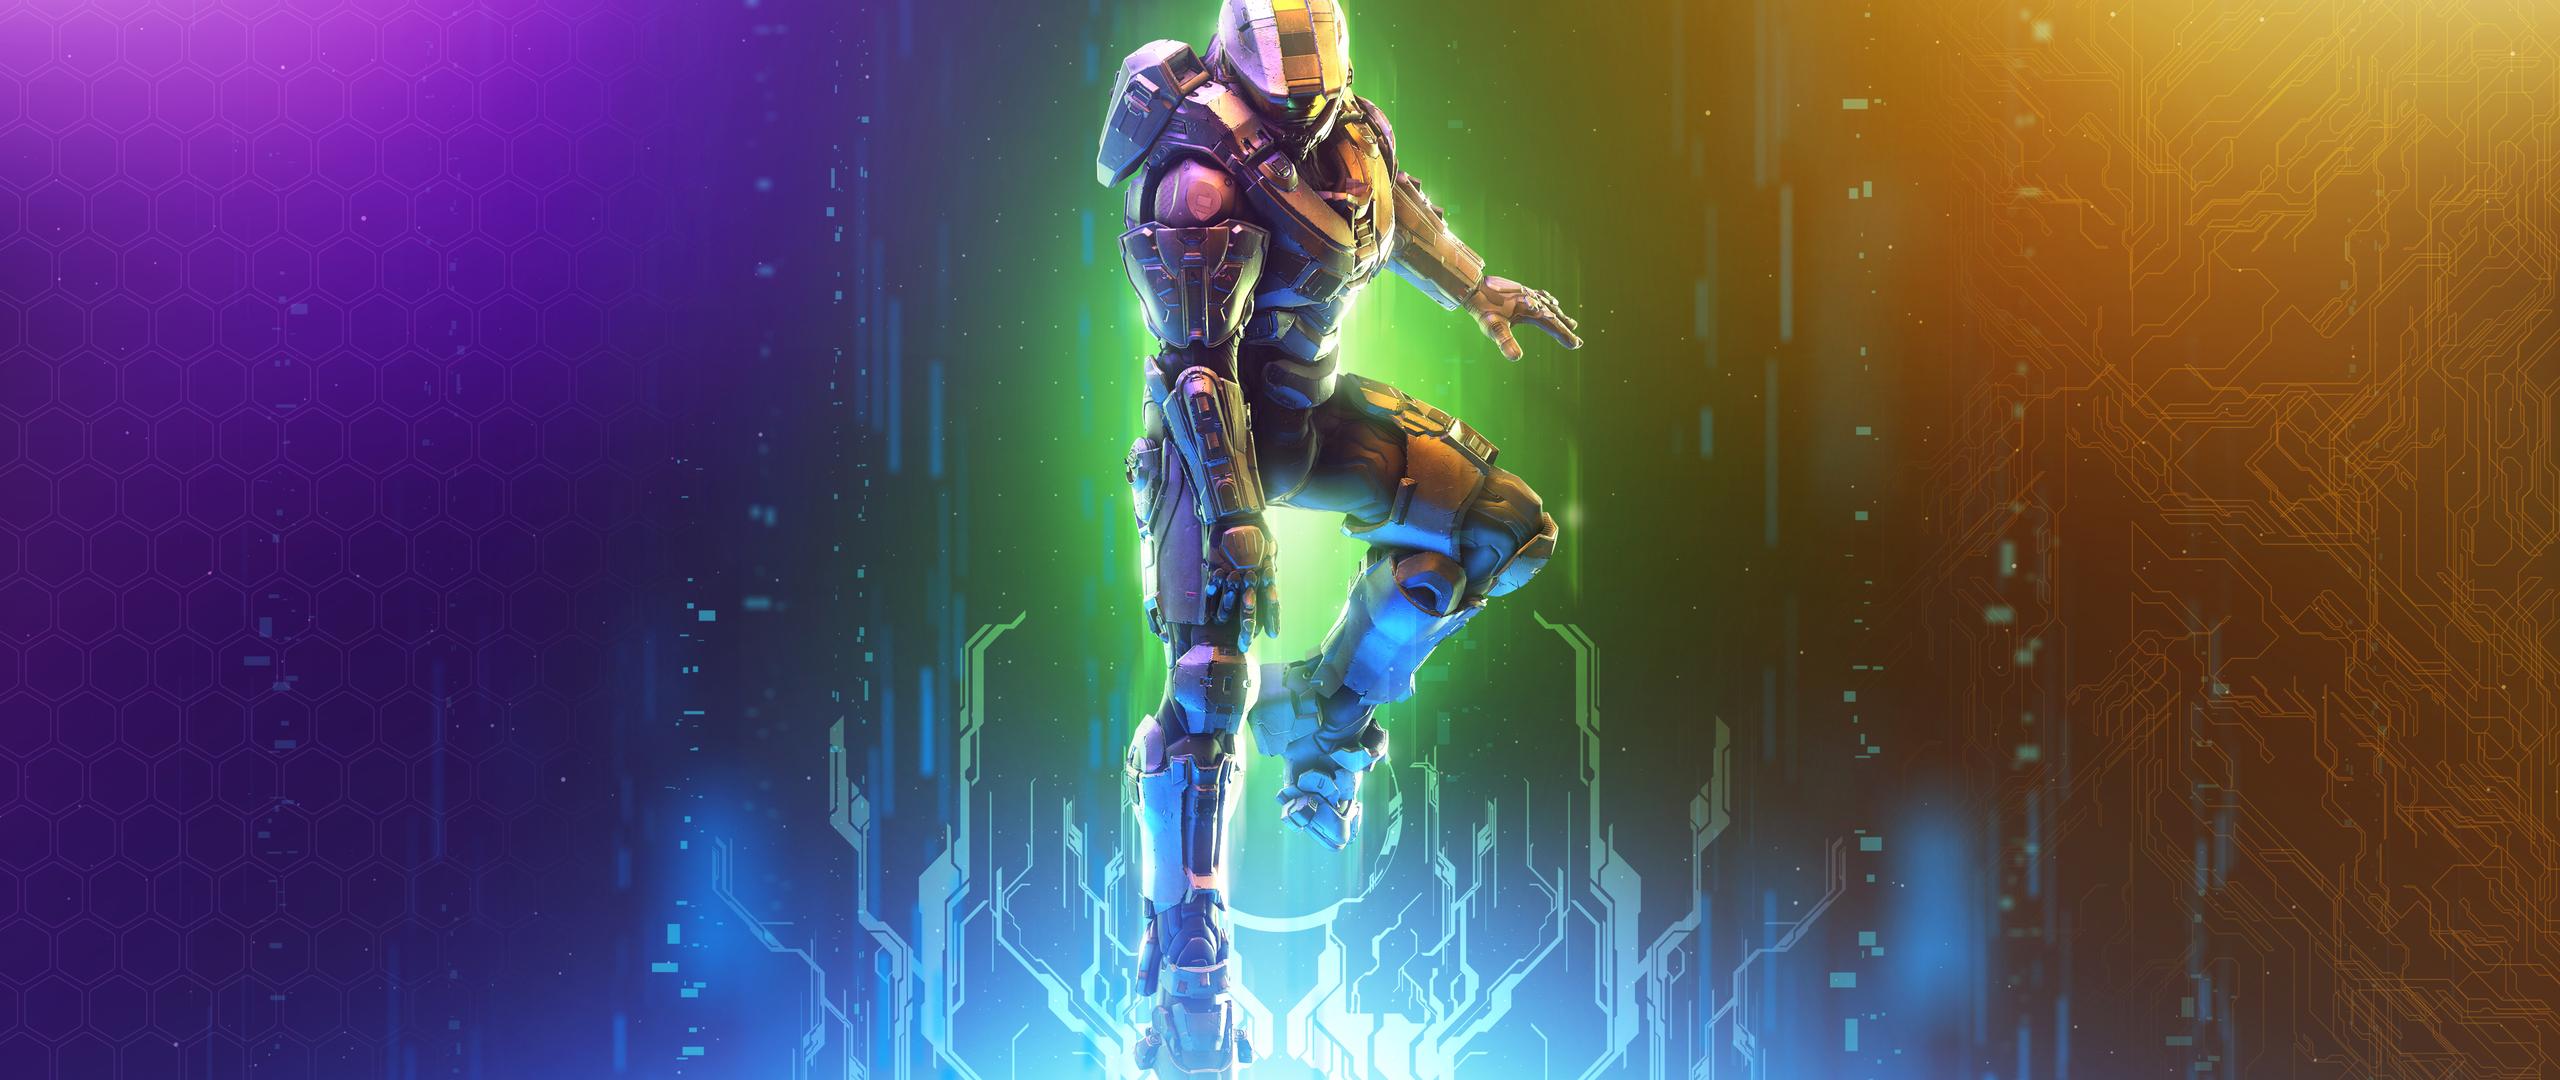 2560x1080 Halo Master Chief Artwork 4k 2560x1080 Resolution